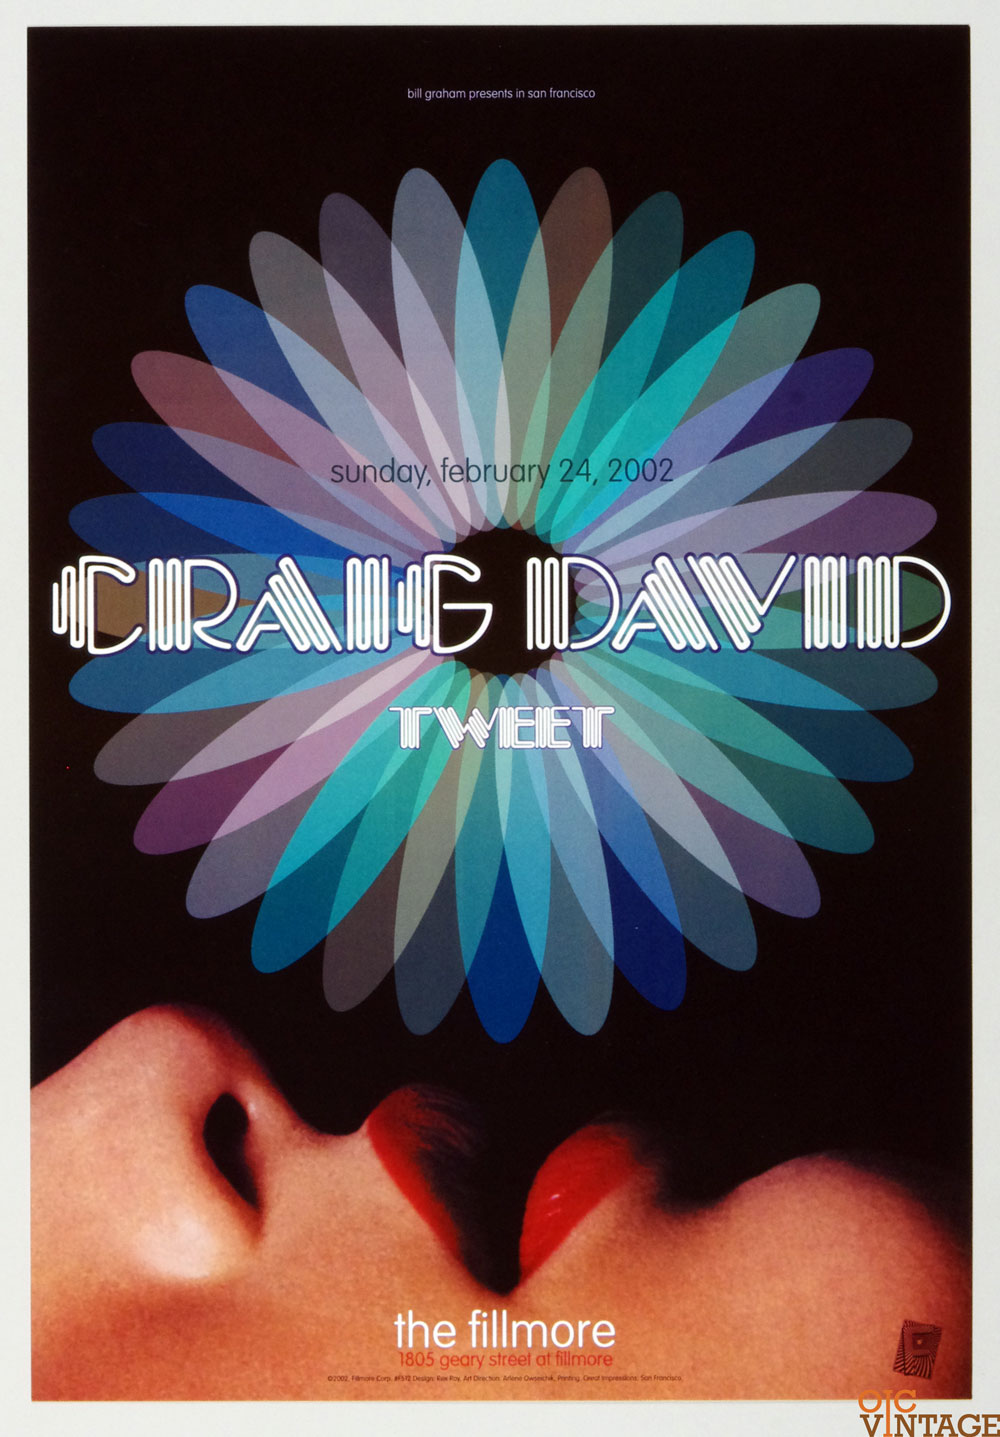 New Fillmore F512 Poster Craig David Tweet 2002 Feb 24